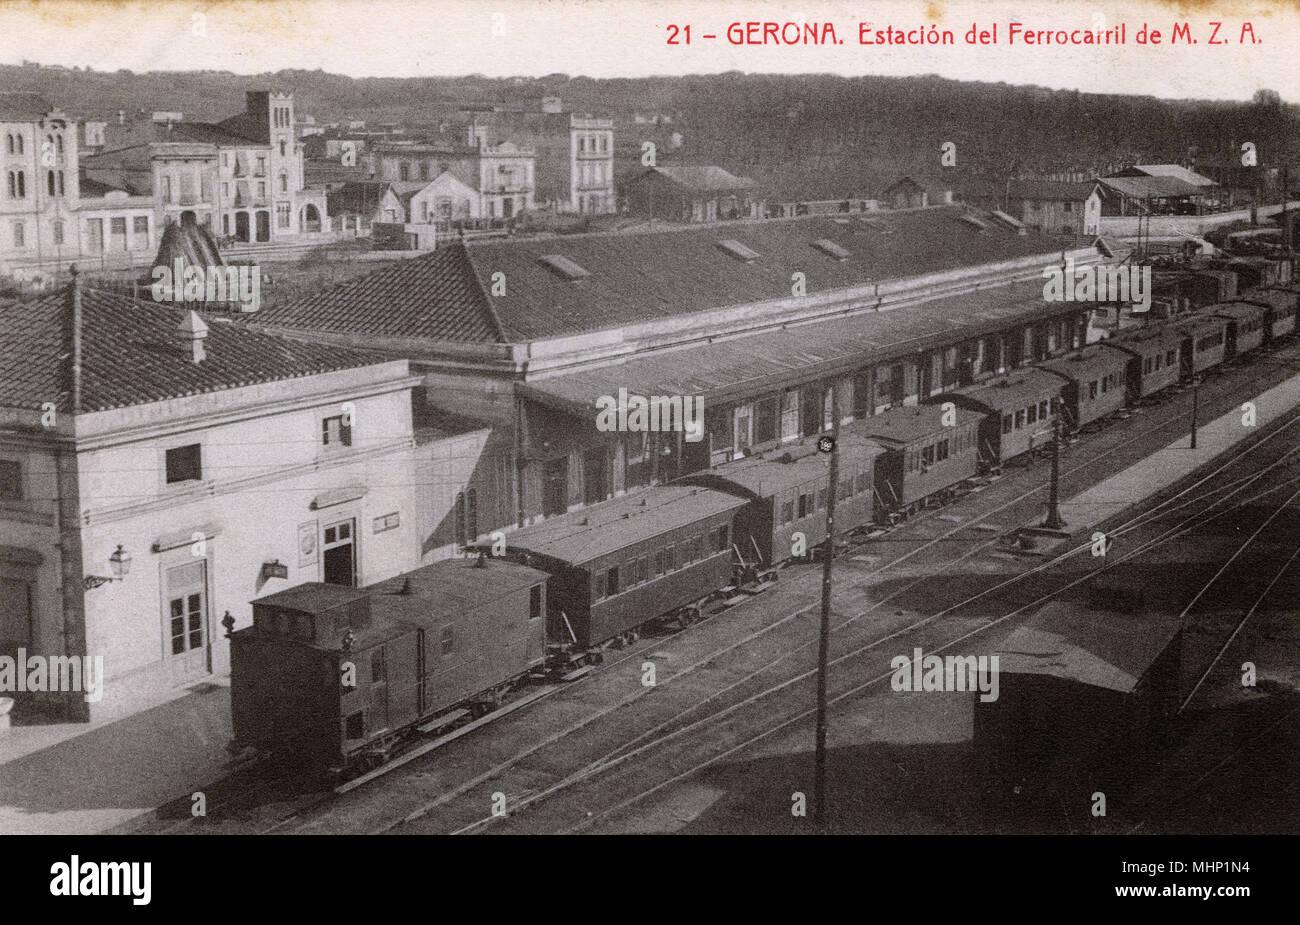 Luftaufnahme der Bahnhof, Girona, Katalonien, Spanien. Datum: ca. 1908 Stockbild